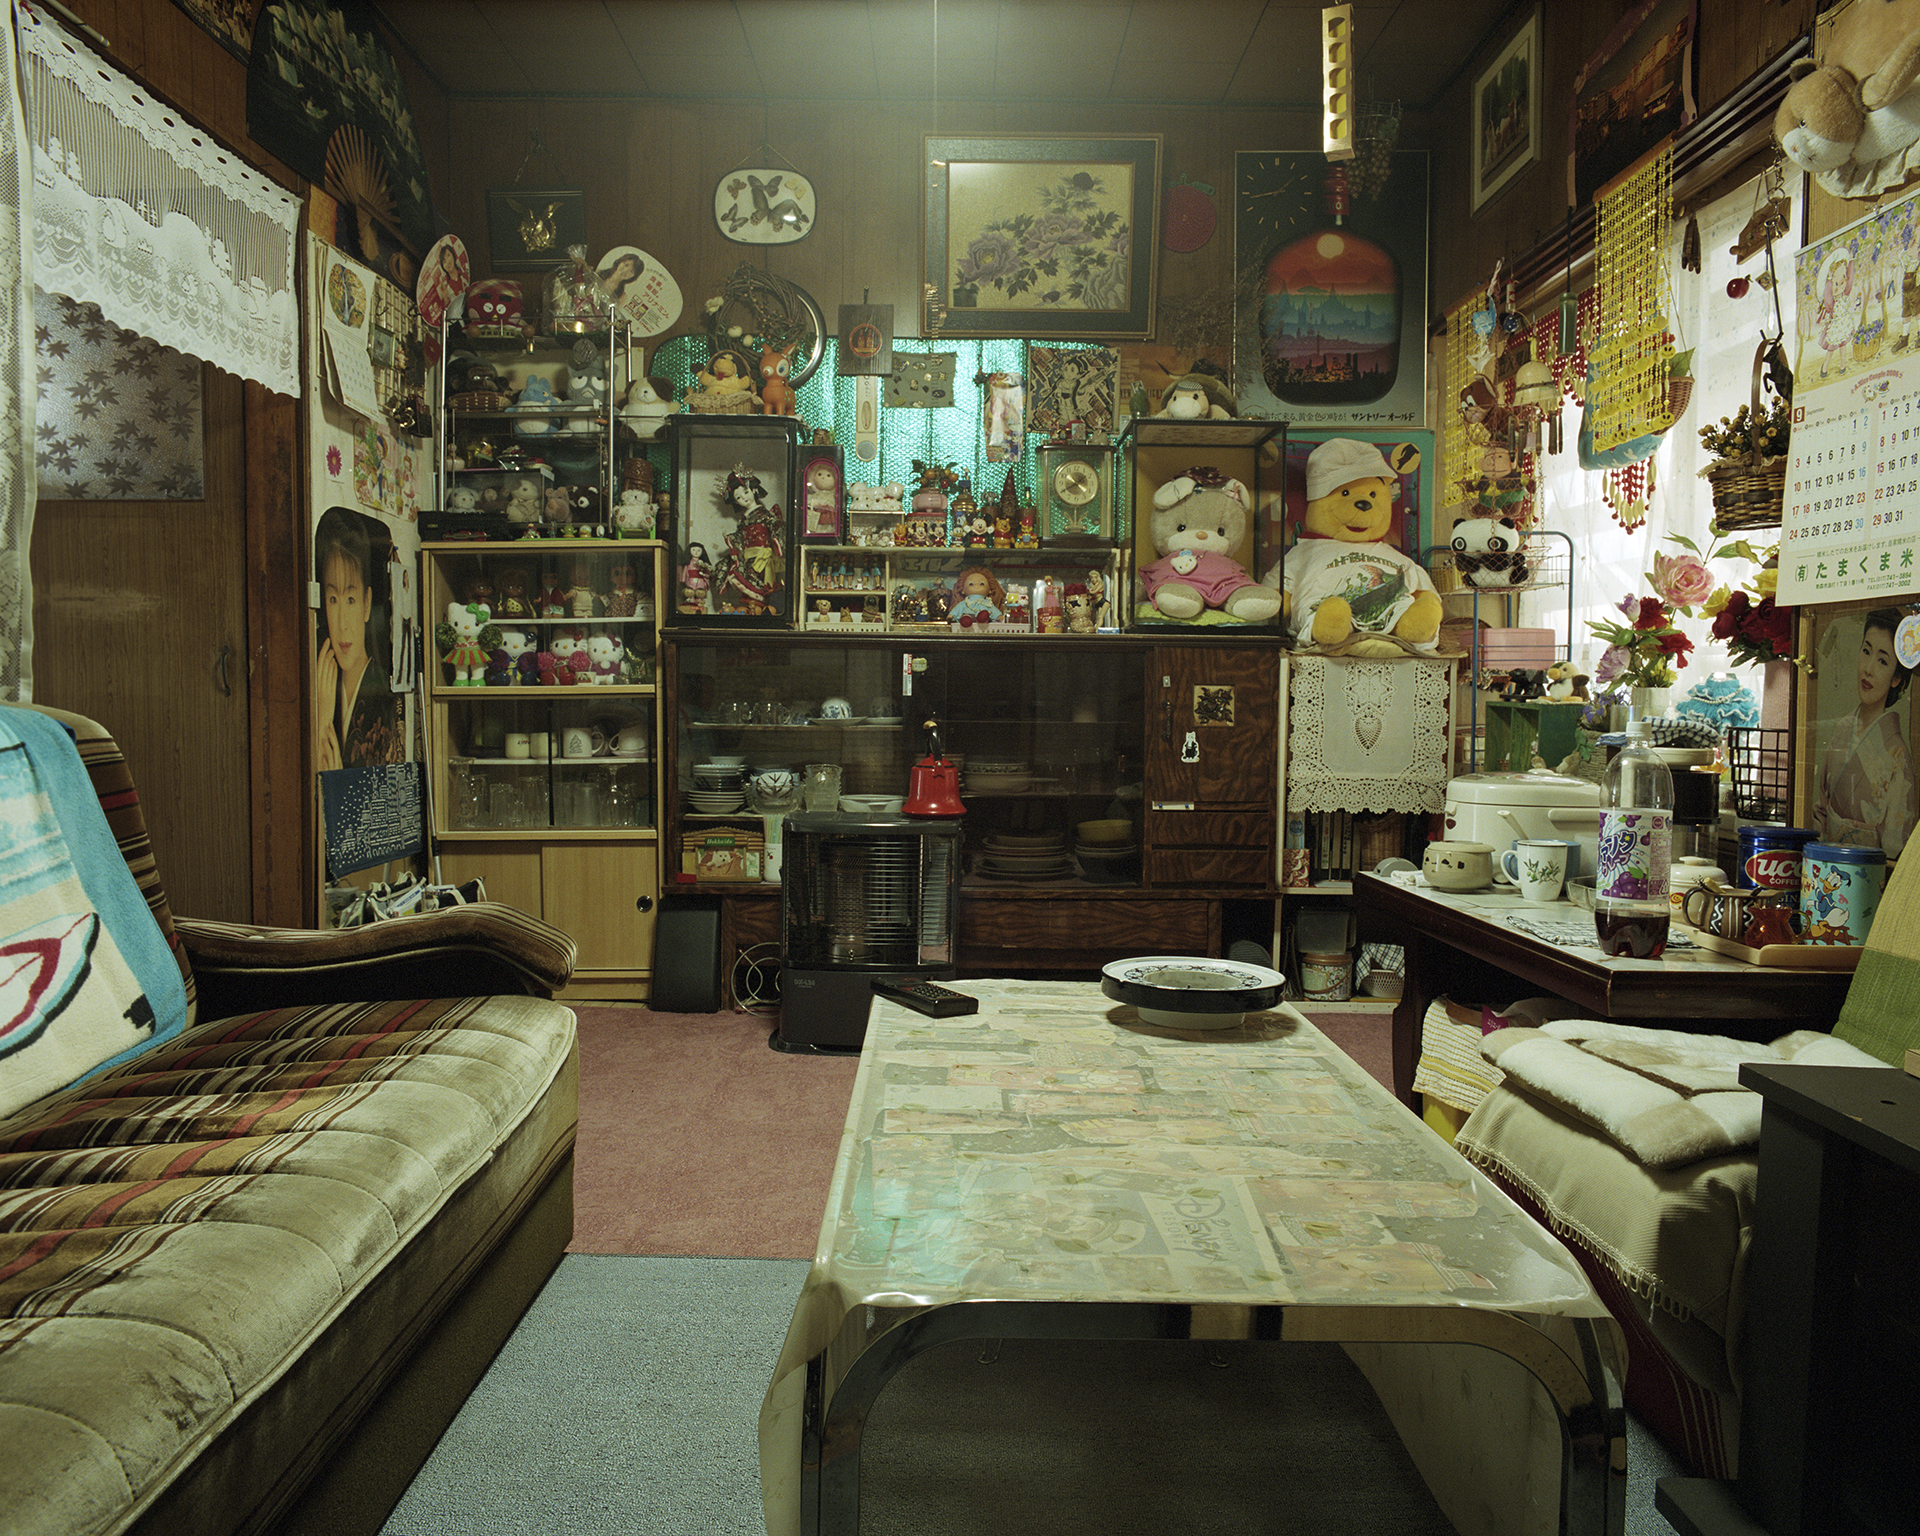 Aomori - the doll's house